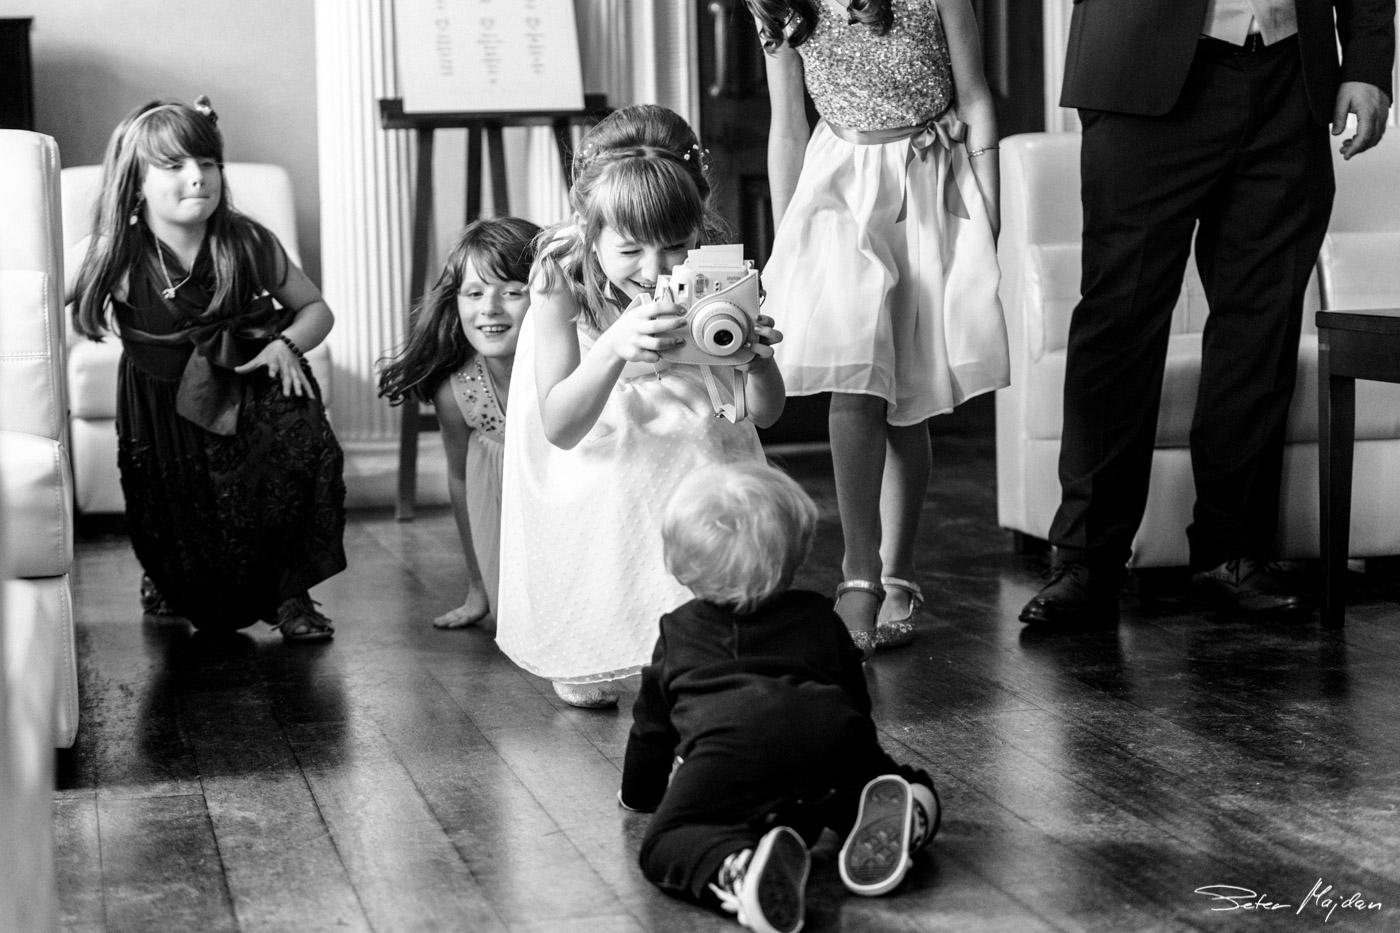 Colwick-hall-wedding-photography-37.jpg